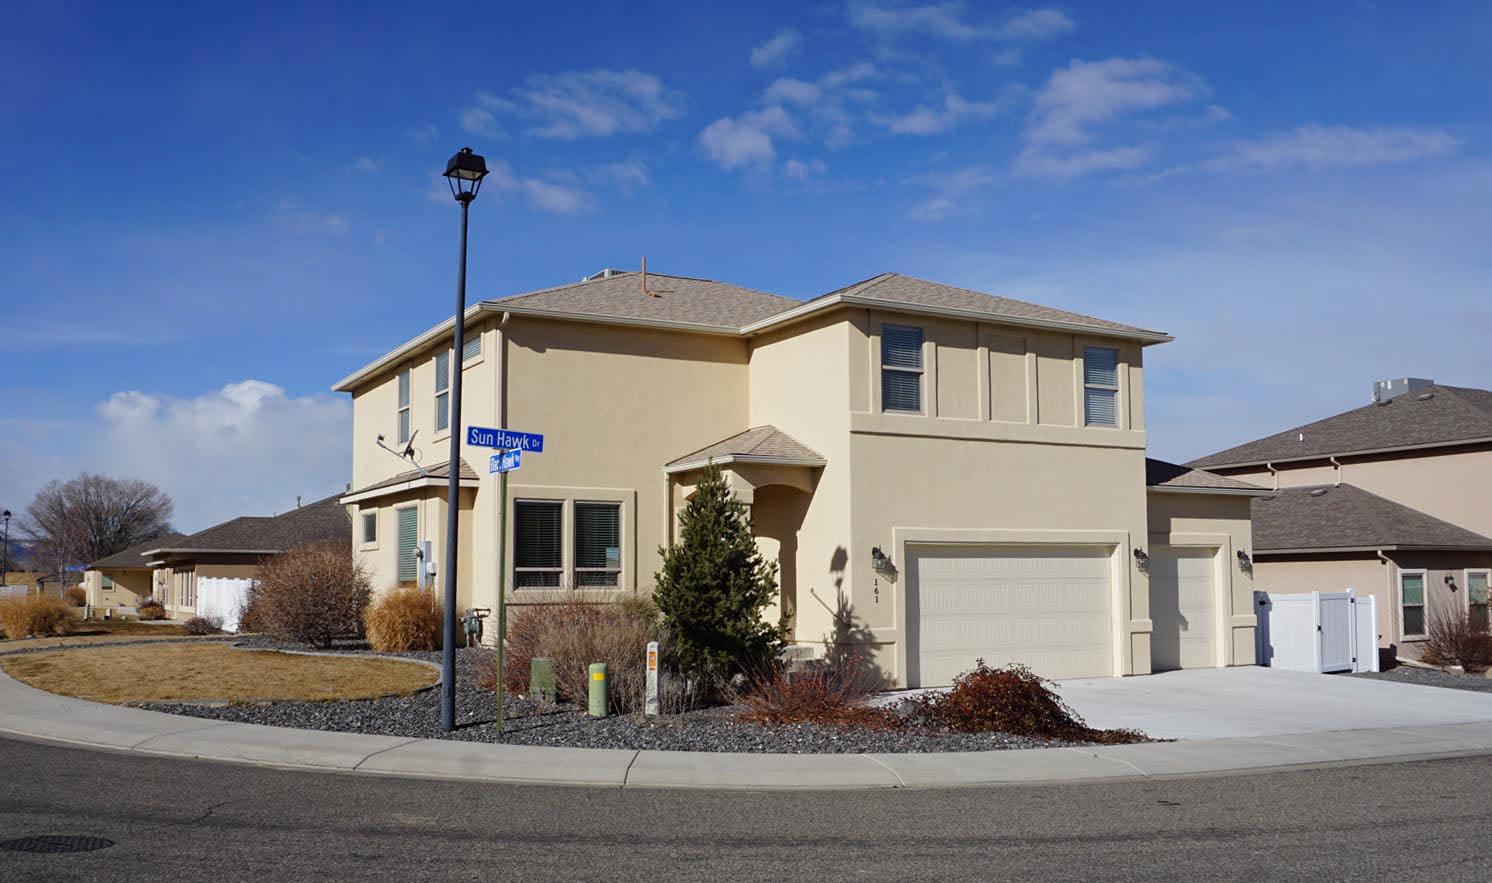 161 Sun Hawk Drive - 5 bedroom 3 bath home with RV parking